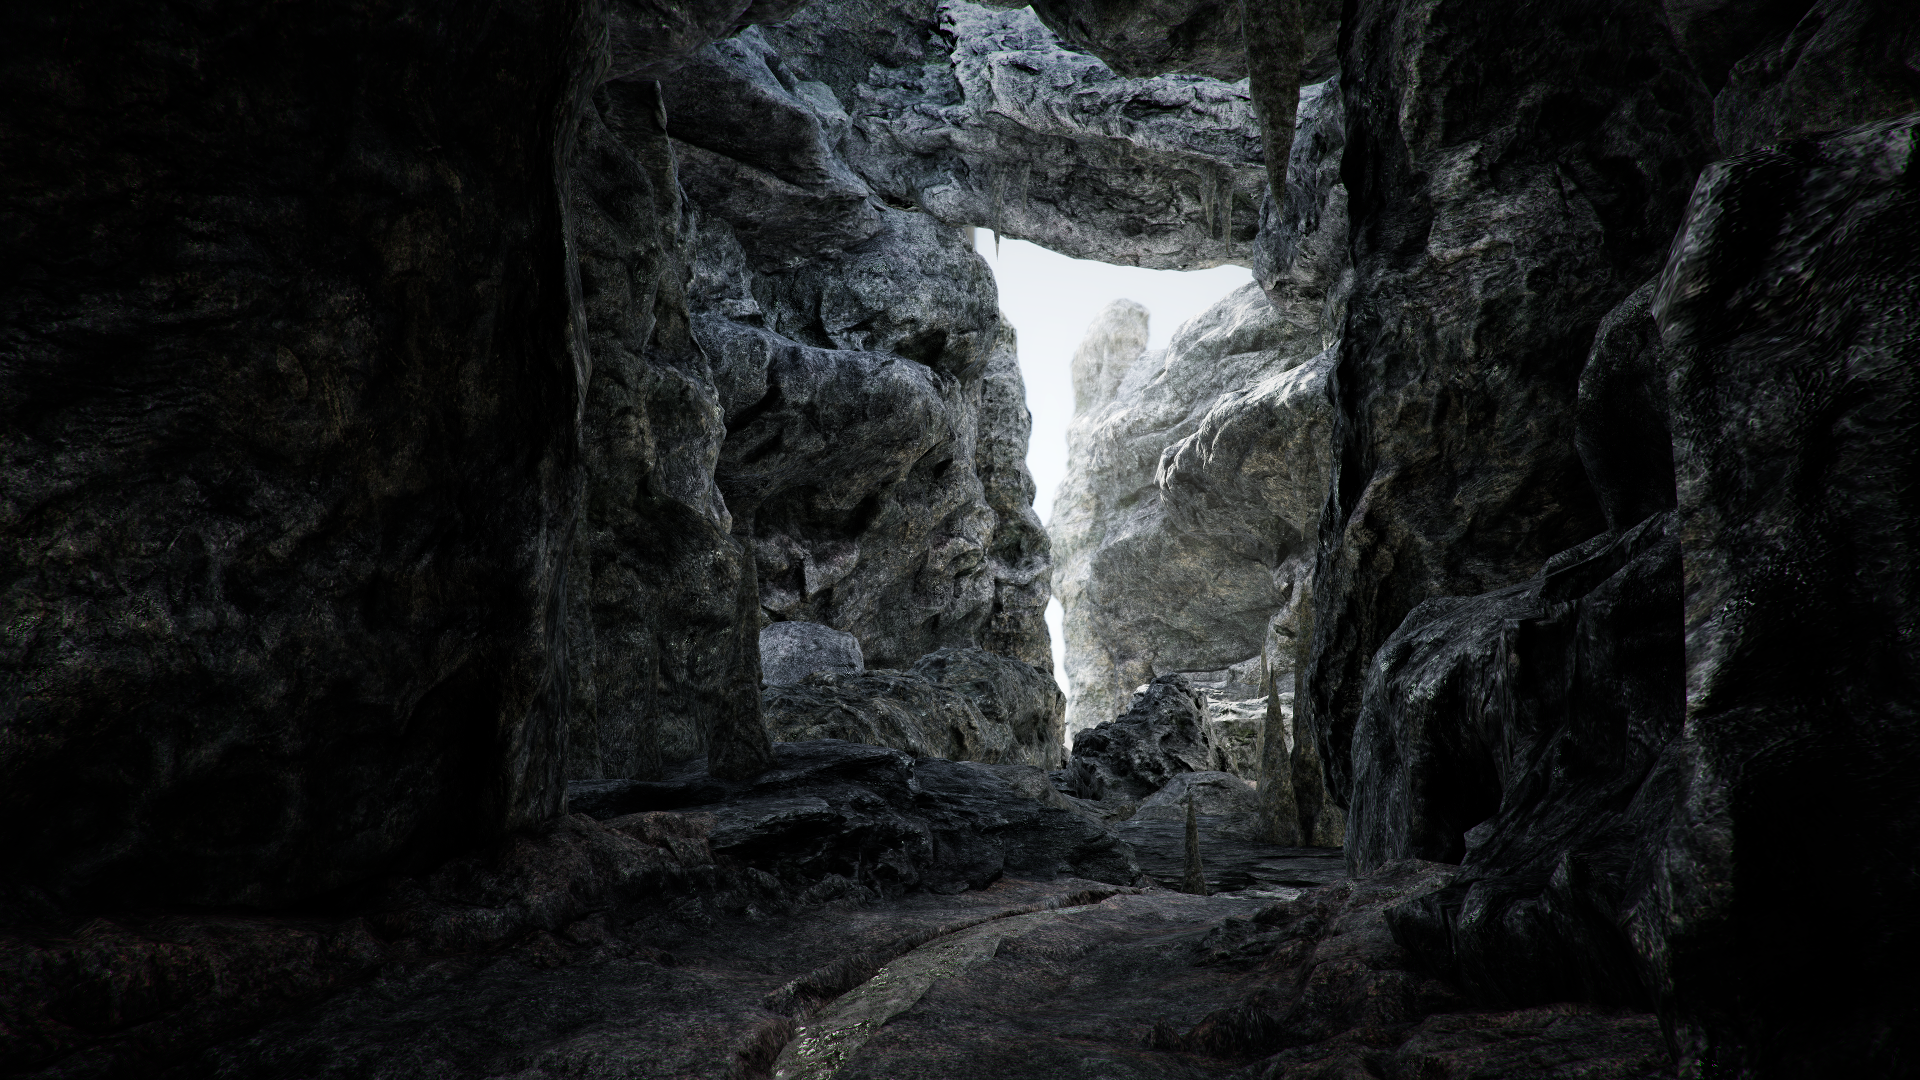 Dark Cave Environment